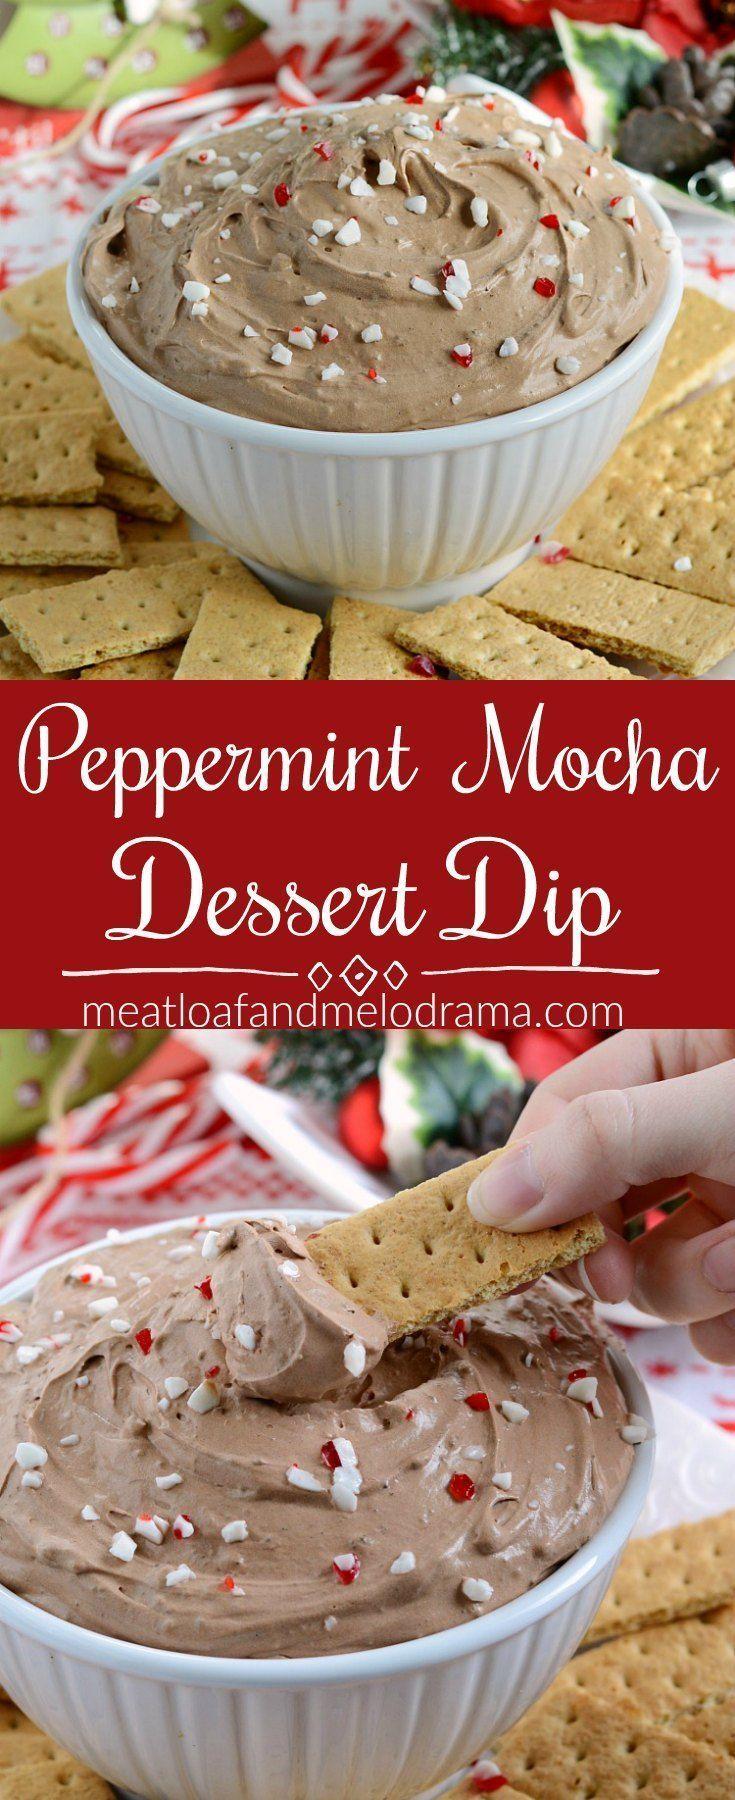 Peppermint Mocha Dessert Dip Meatloaf And Melodrama Recipe Peppermint Dessert Christmas Desserts Easy Mocha Desserts